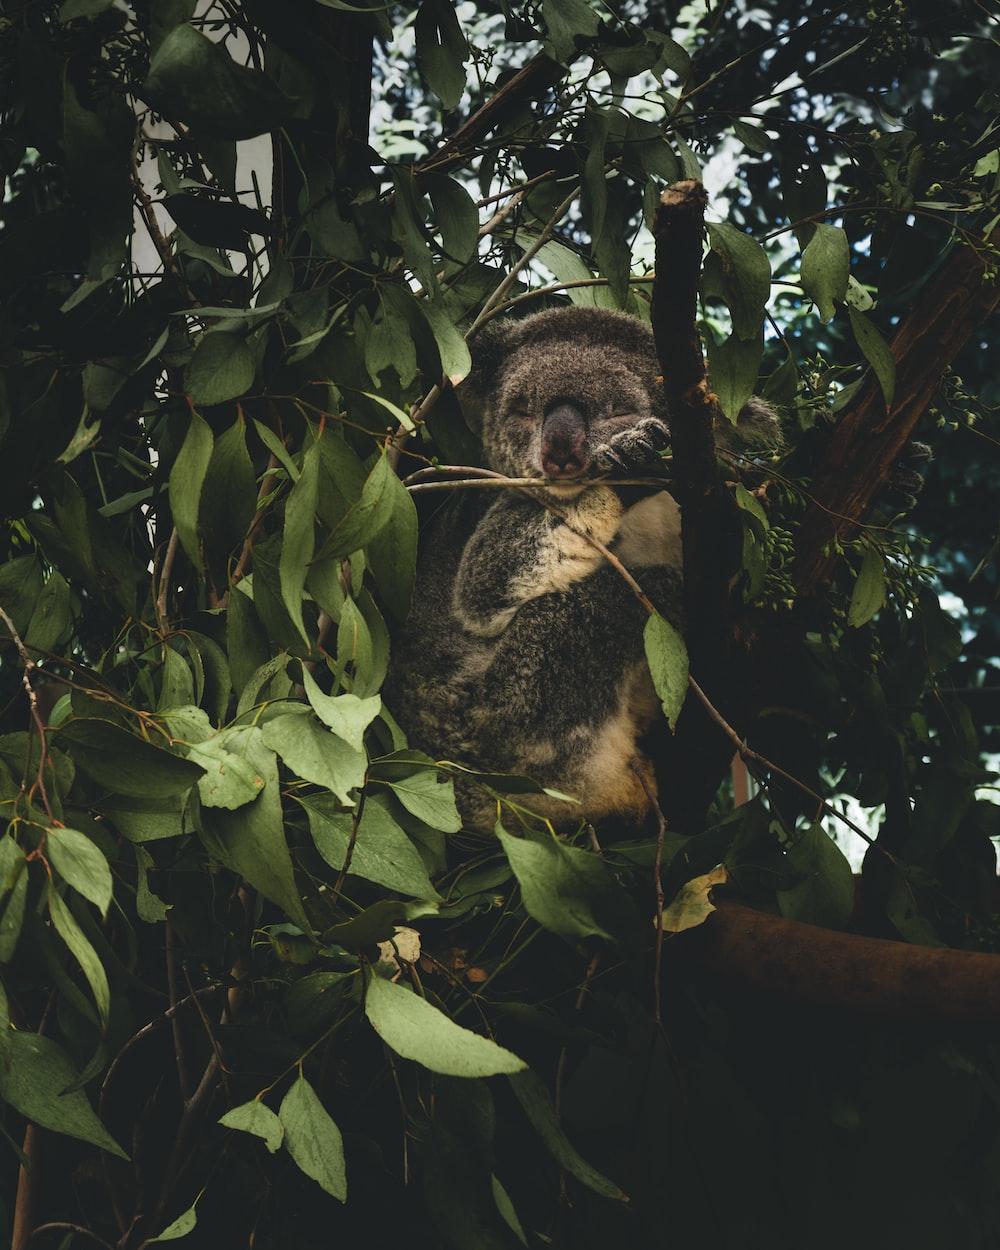 black and white koala on tree branch during daytime